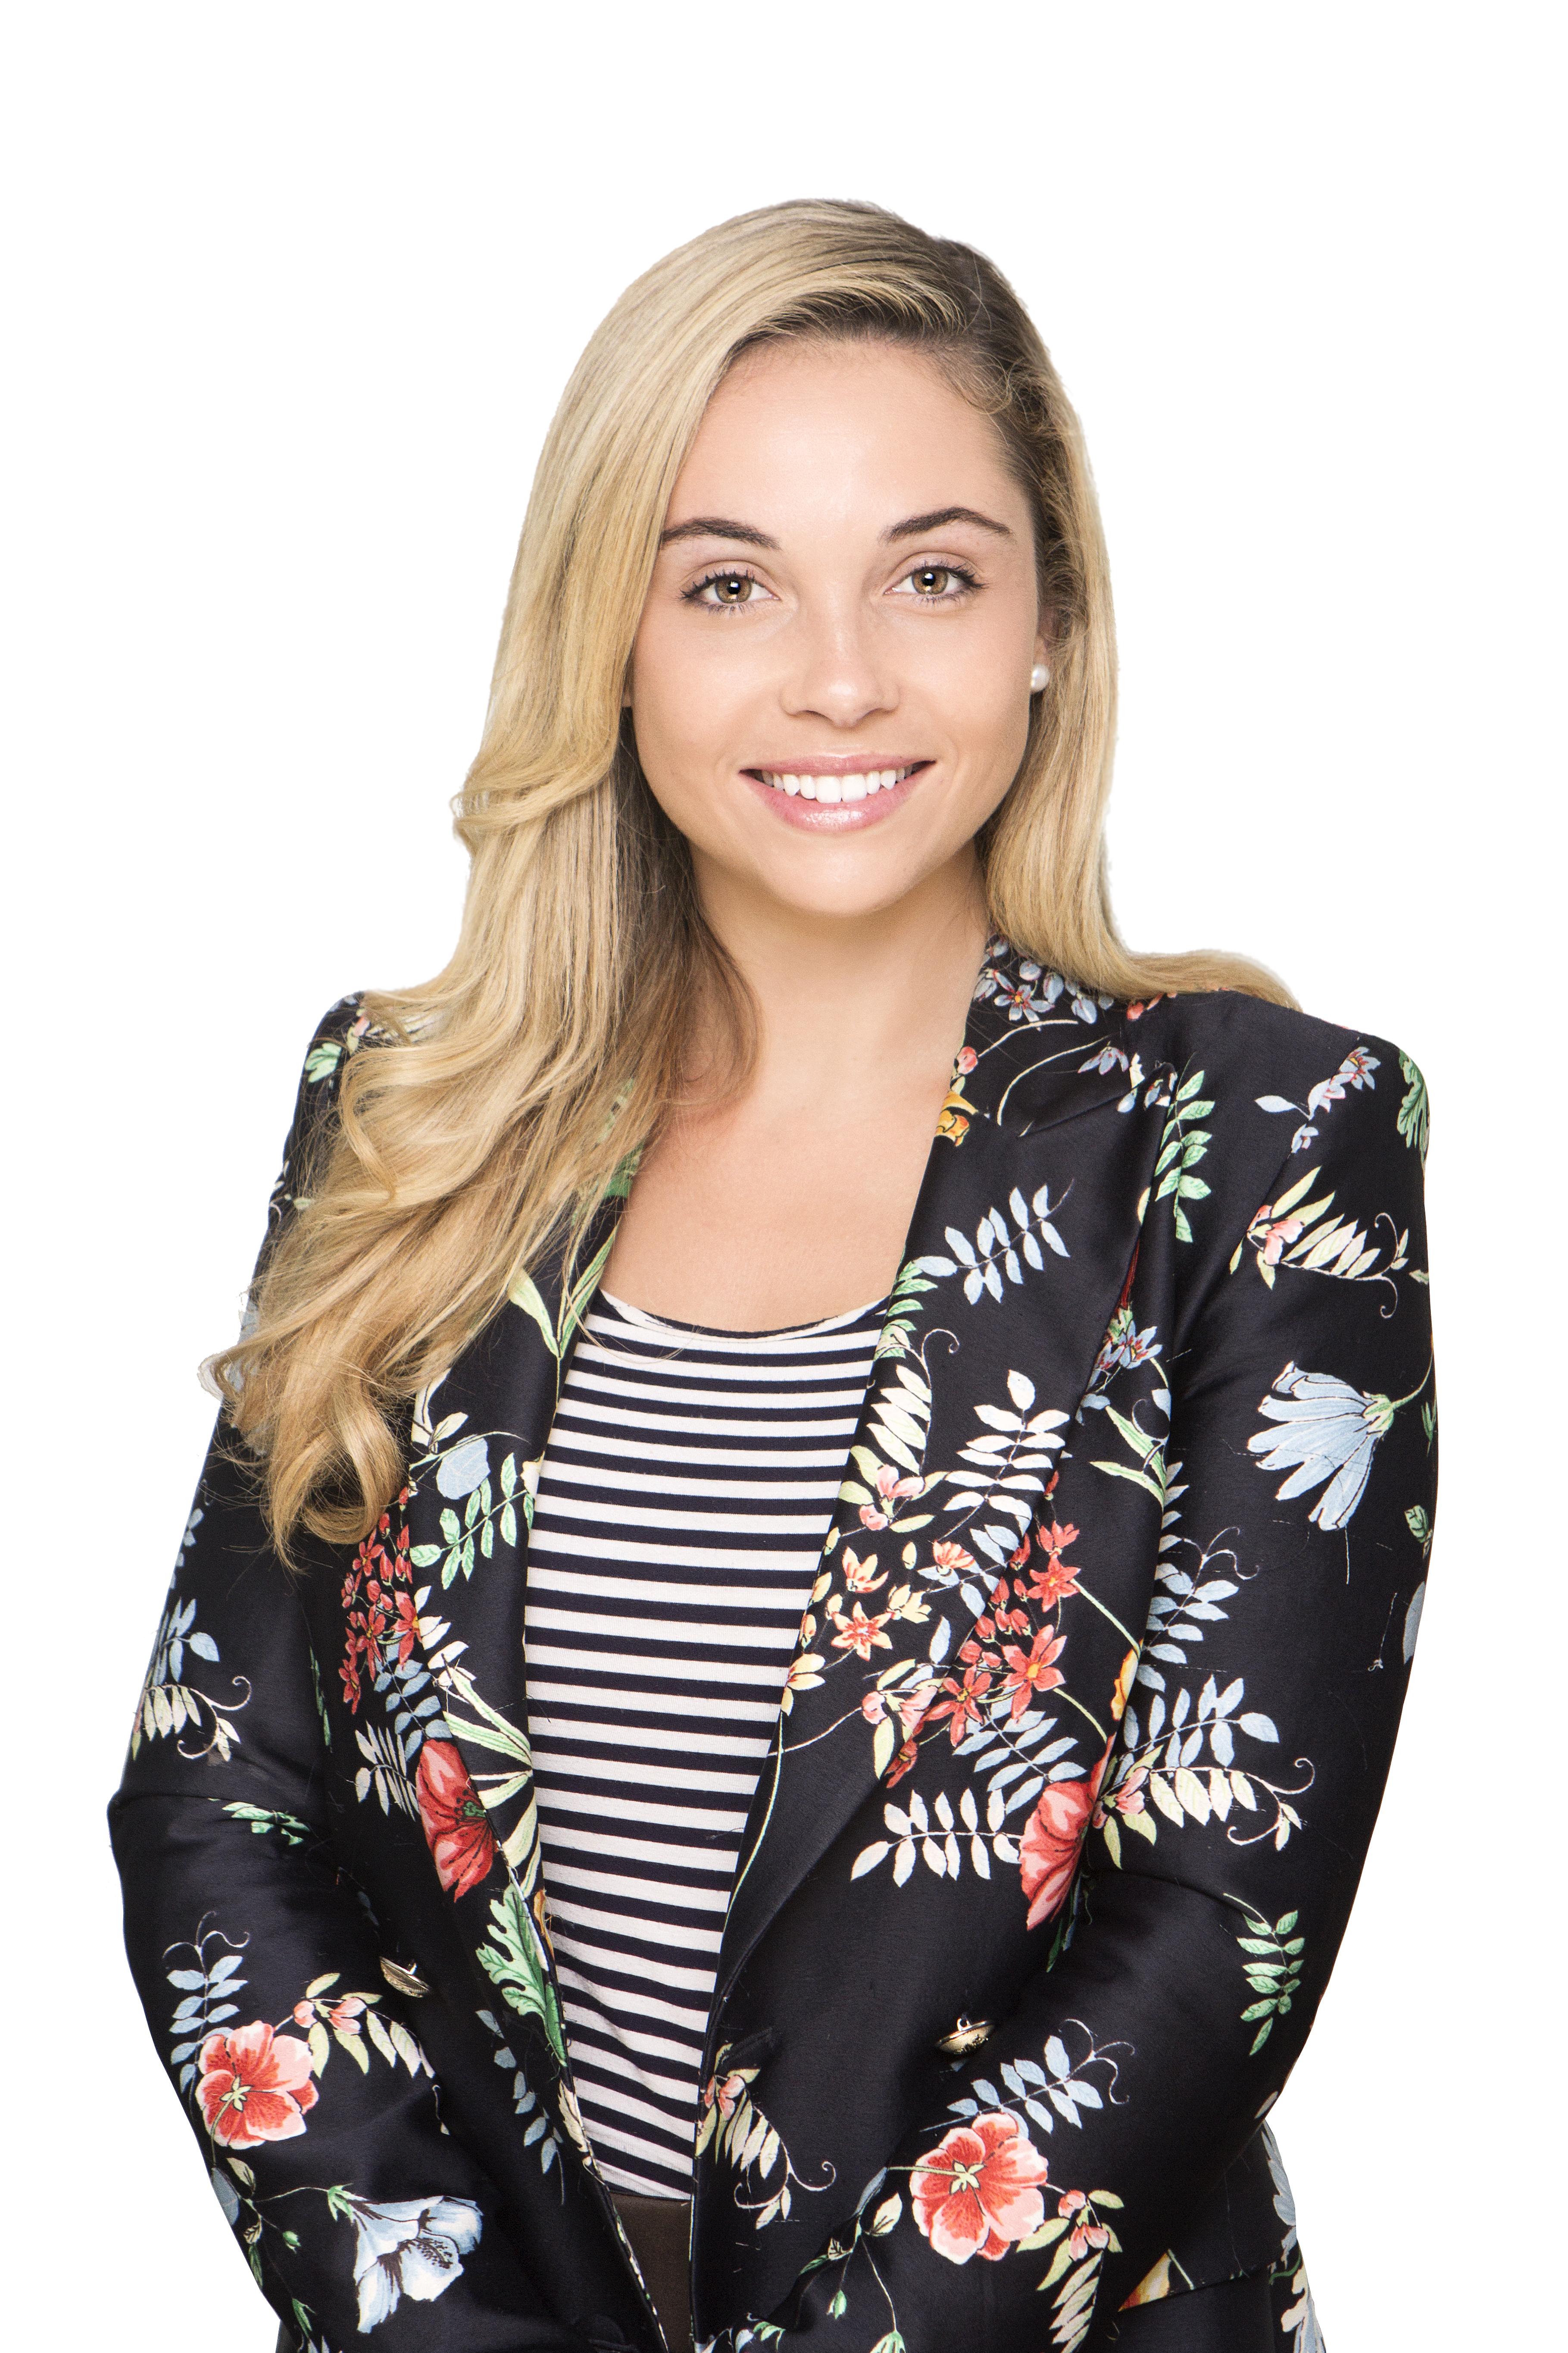 Samantha Panarello